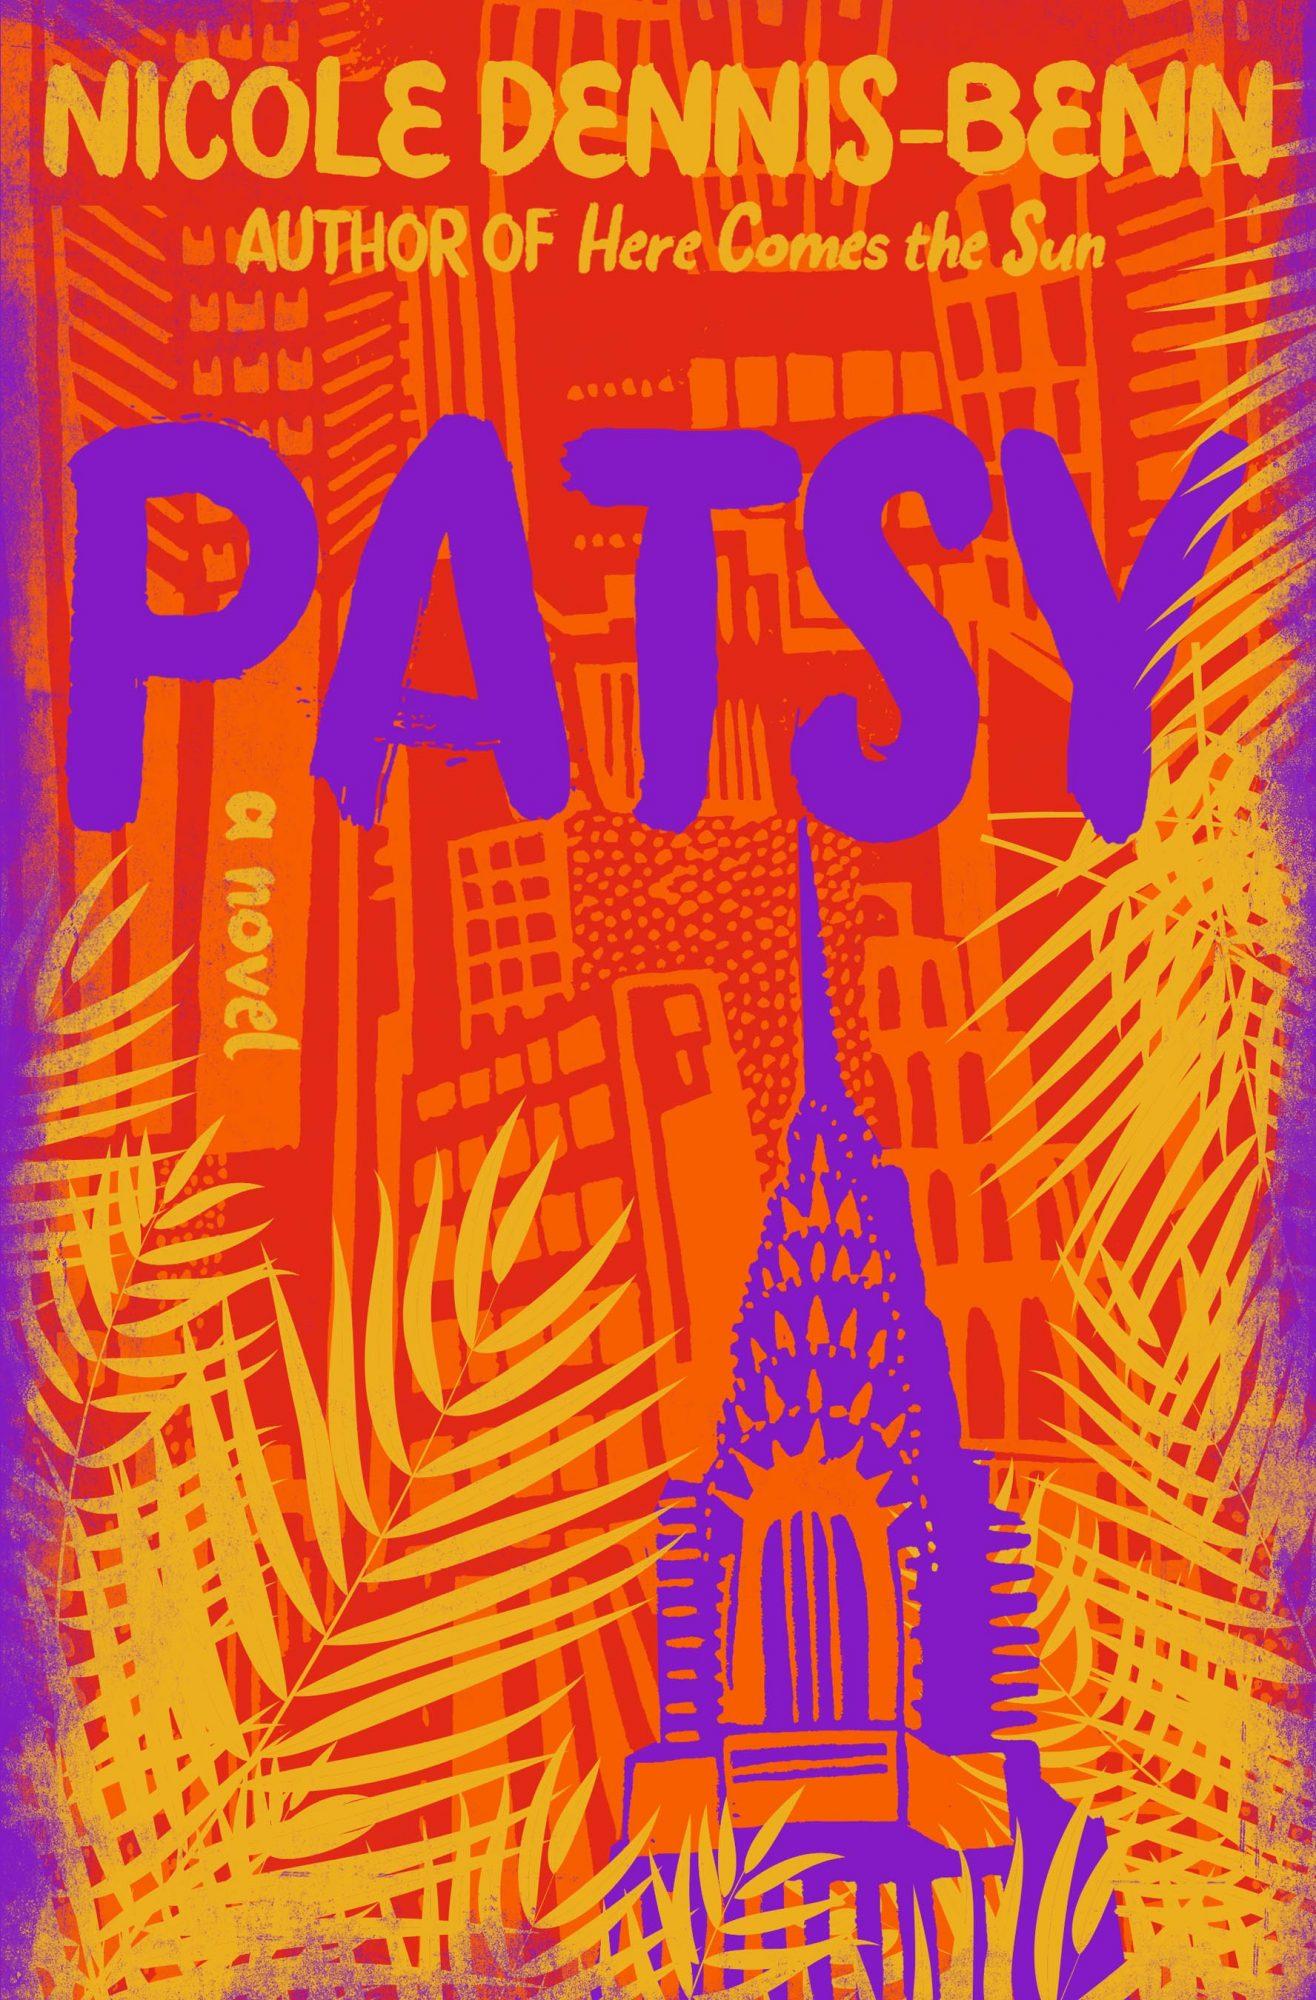 Patsy (2019)Author: Nicole Dennis-Benn